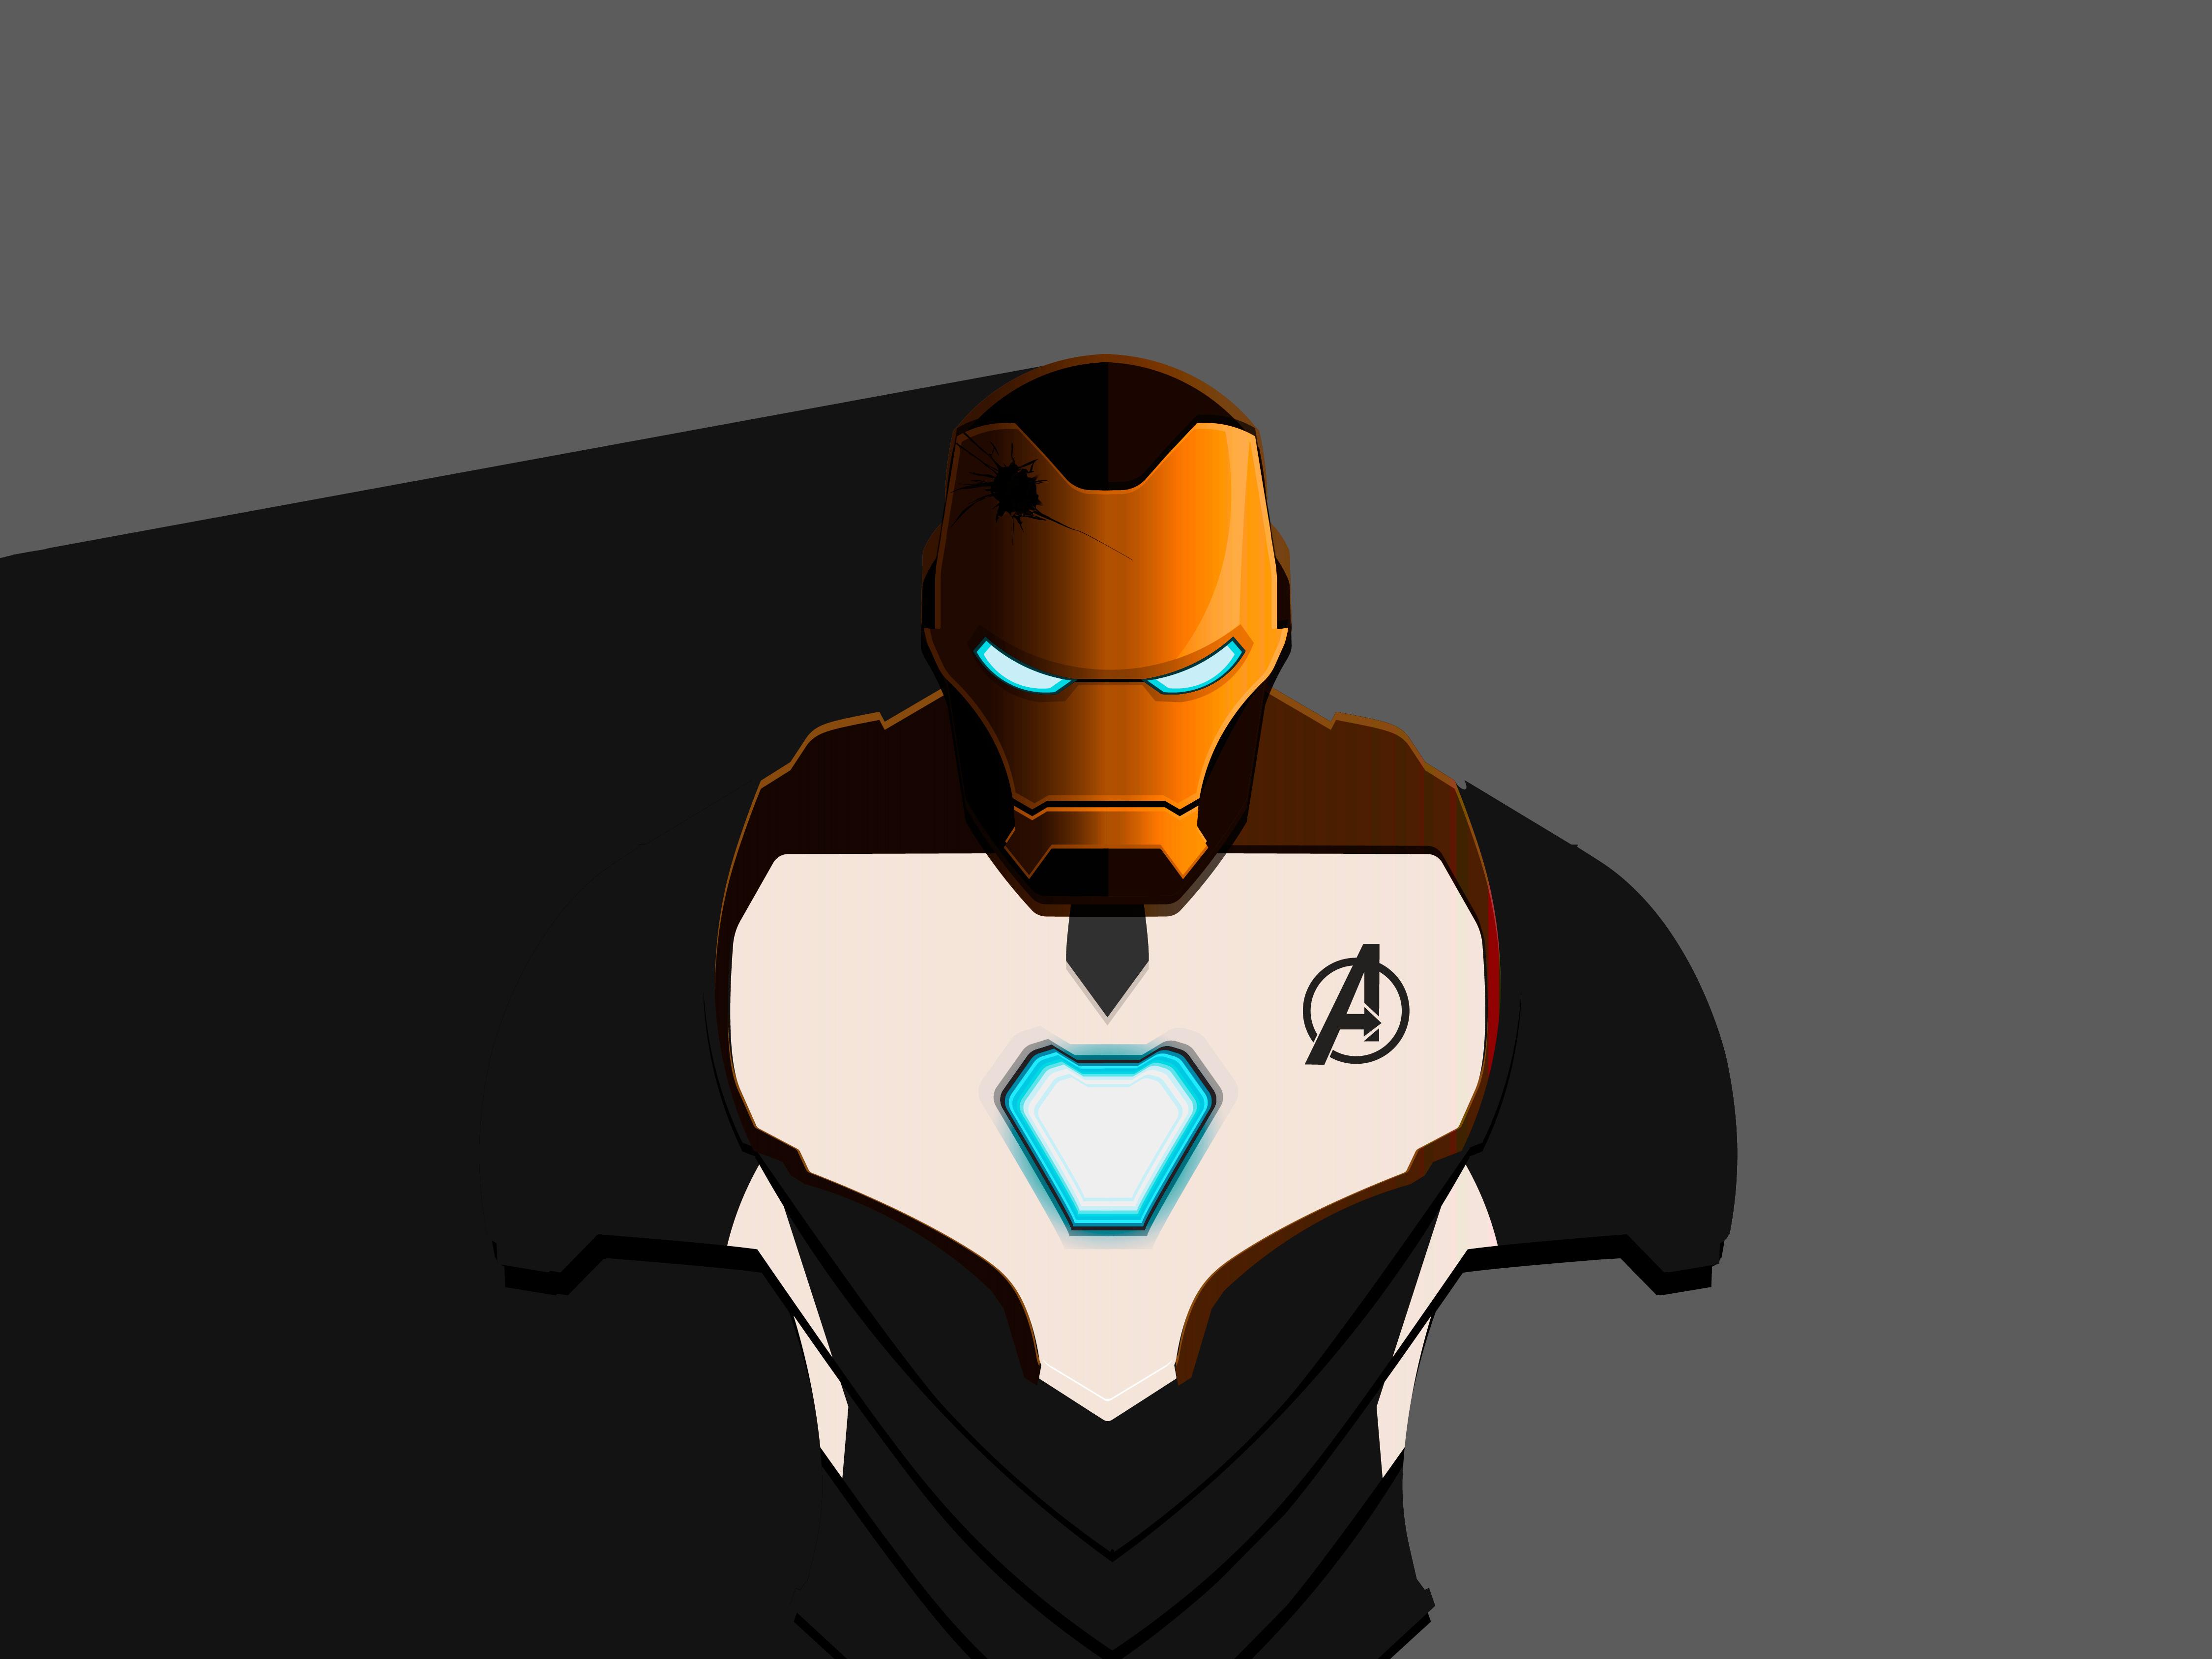 Iron man mark 50 avengers endgame hd superheroes 4k - Iron man cartoon hd ...